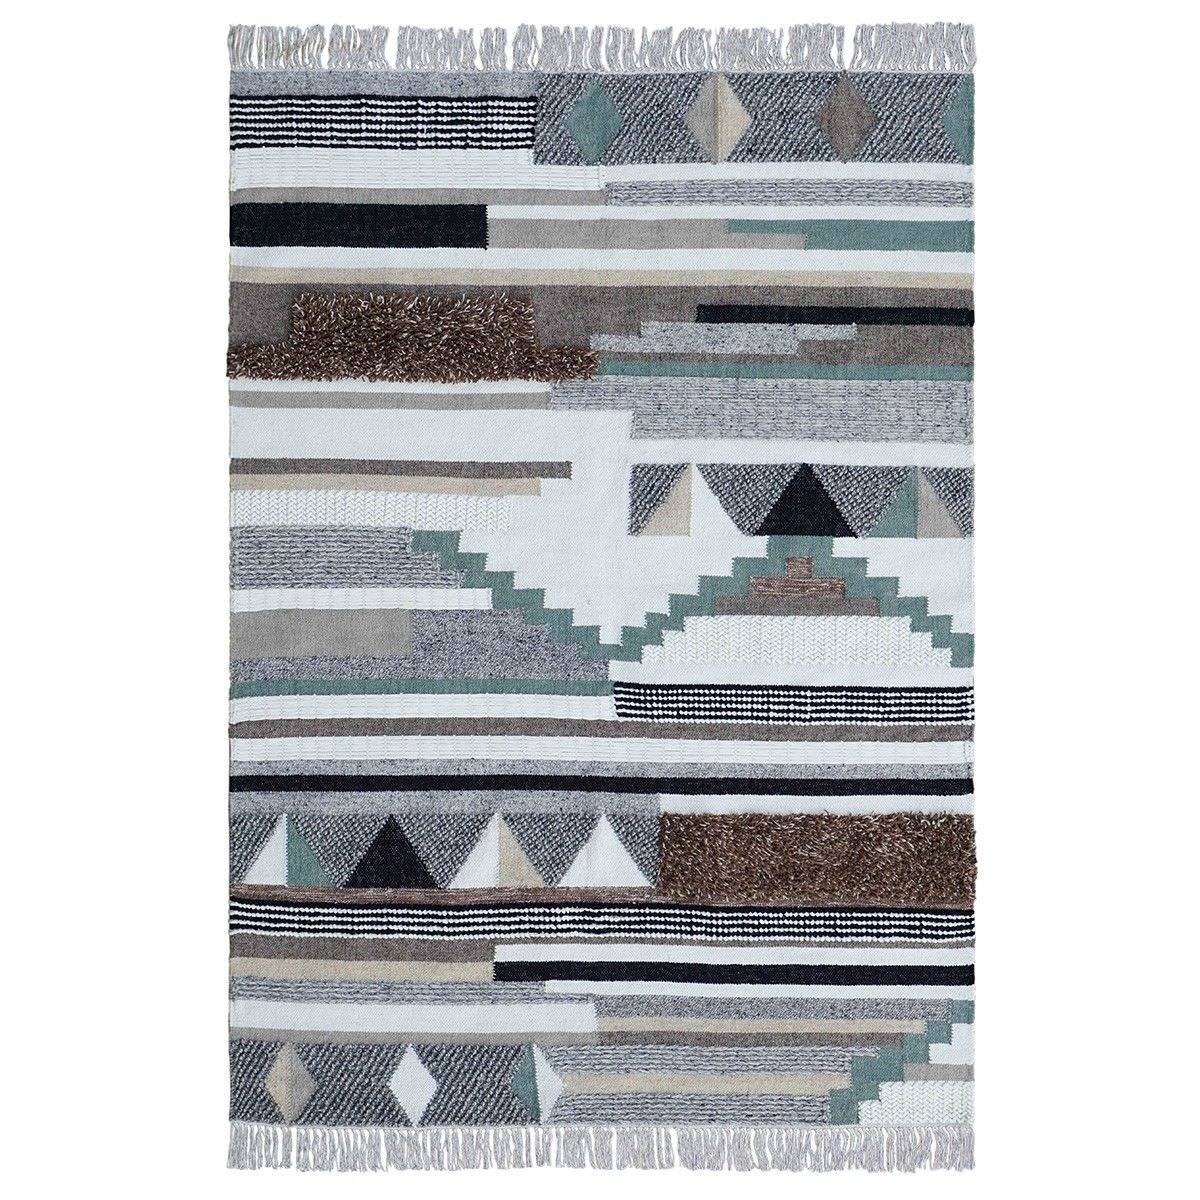 Adi Handwoven Wool Rug, 280x190cm